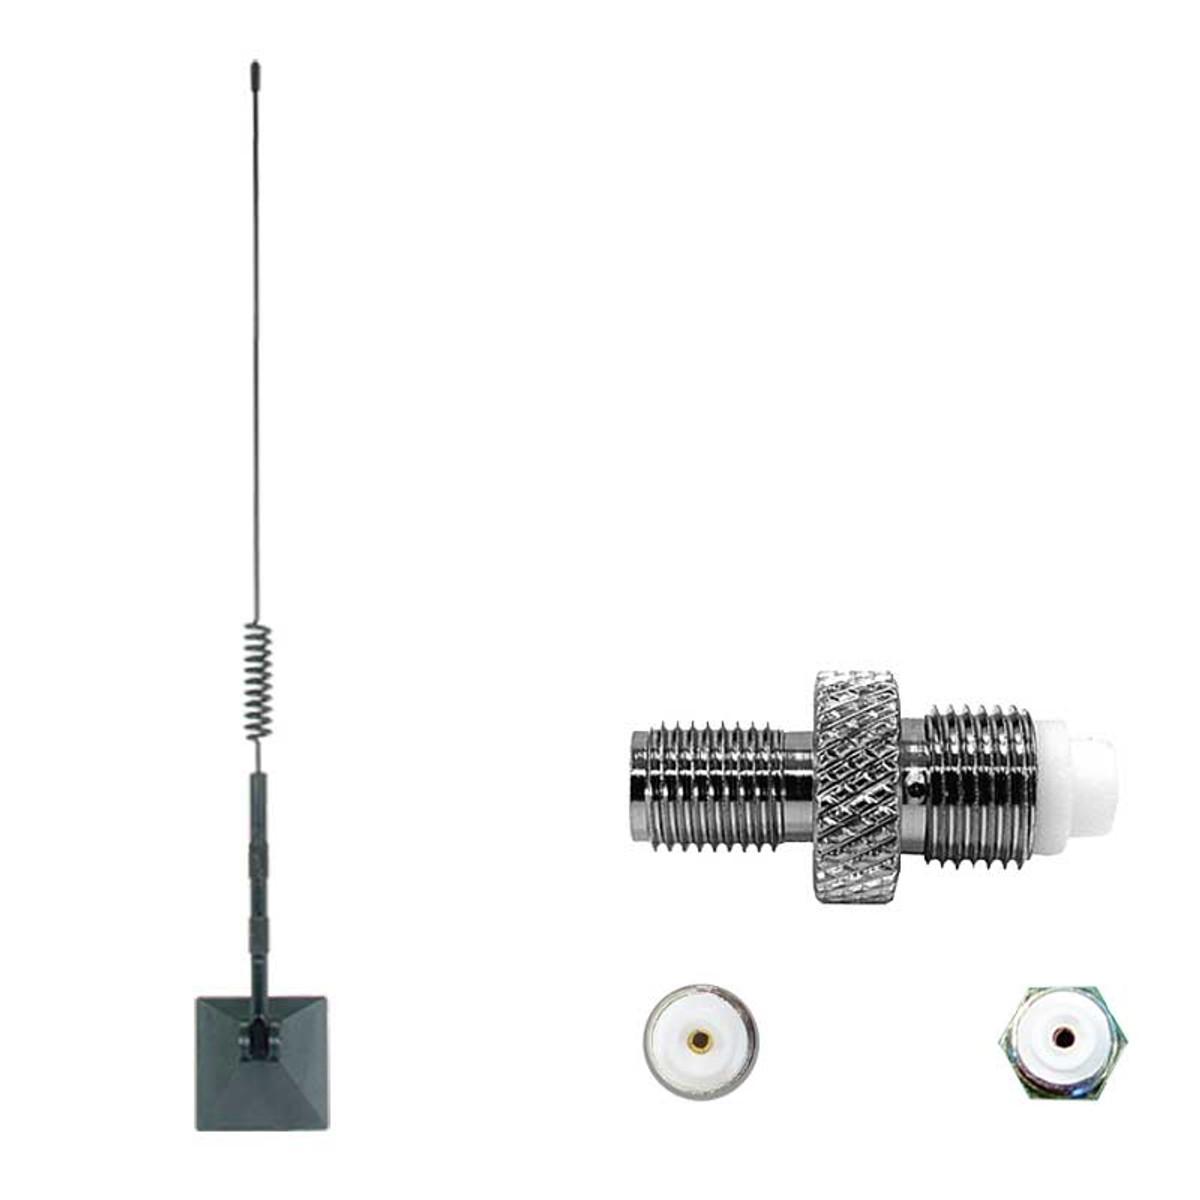 Wilson 311102-B Glass Mount Antenna Dual Band 800-1900 MHz, main